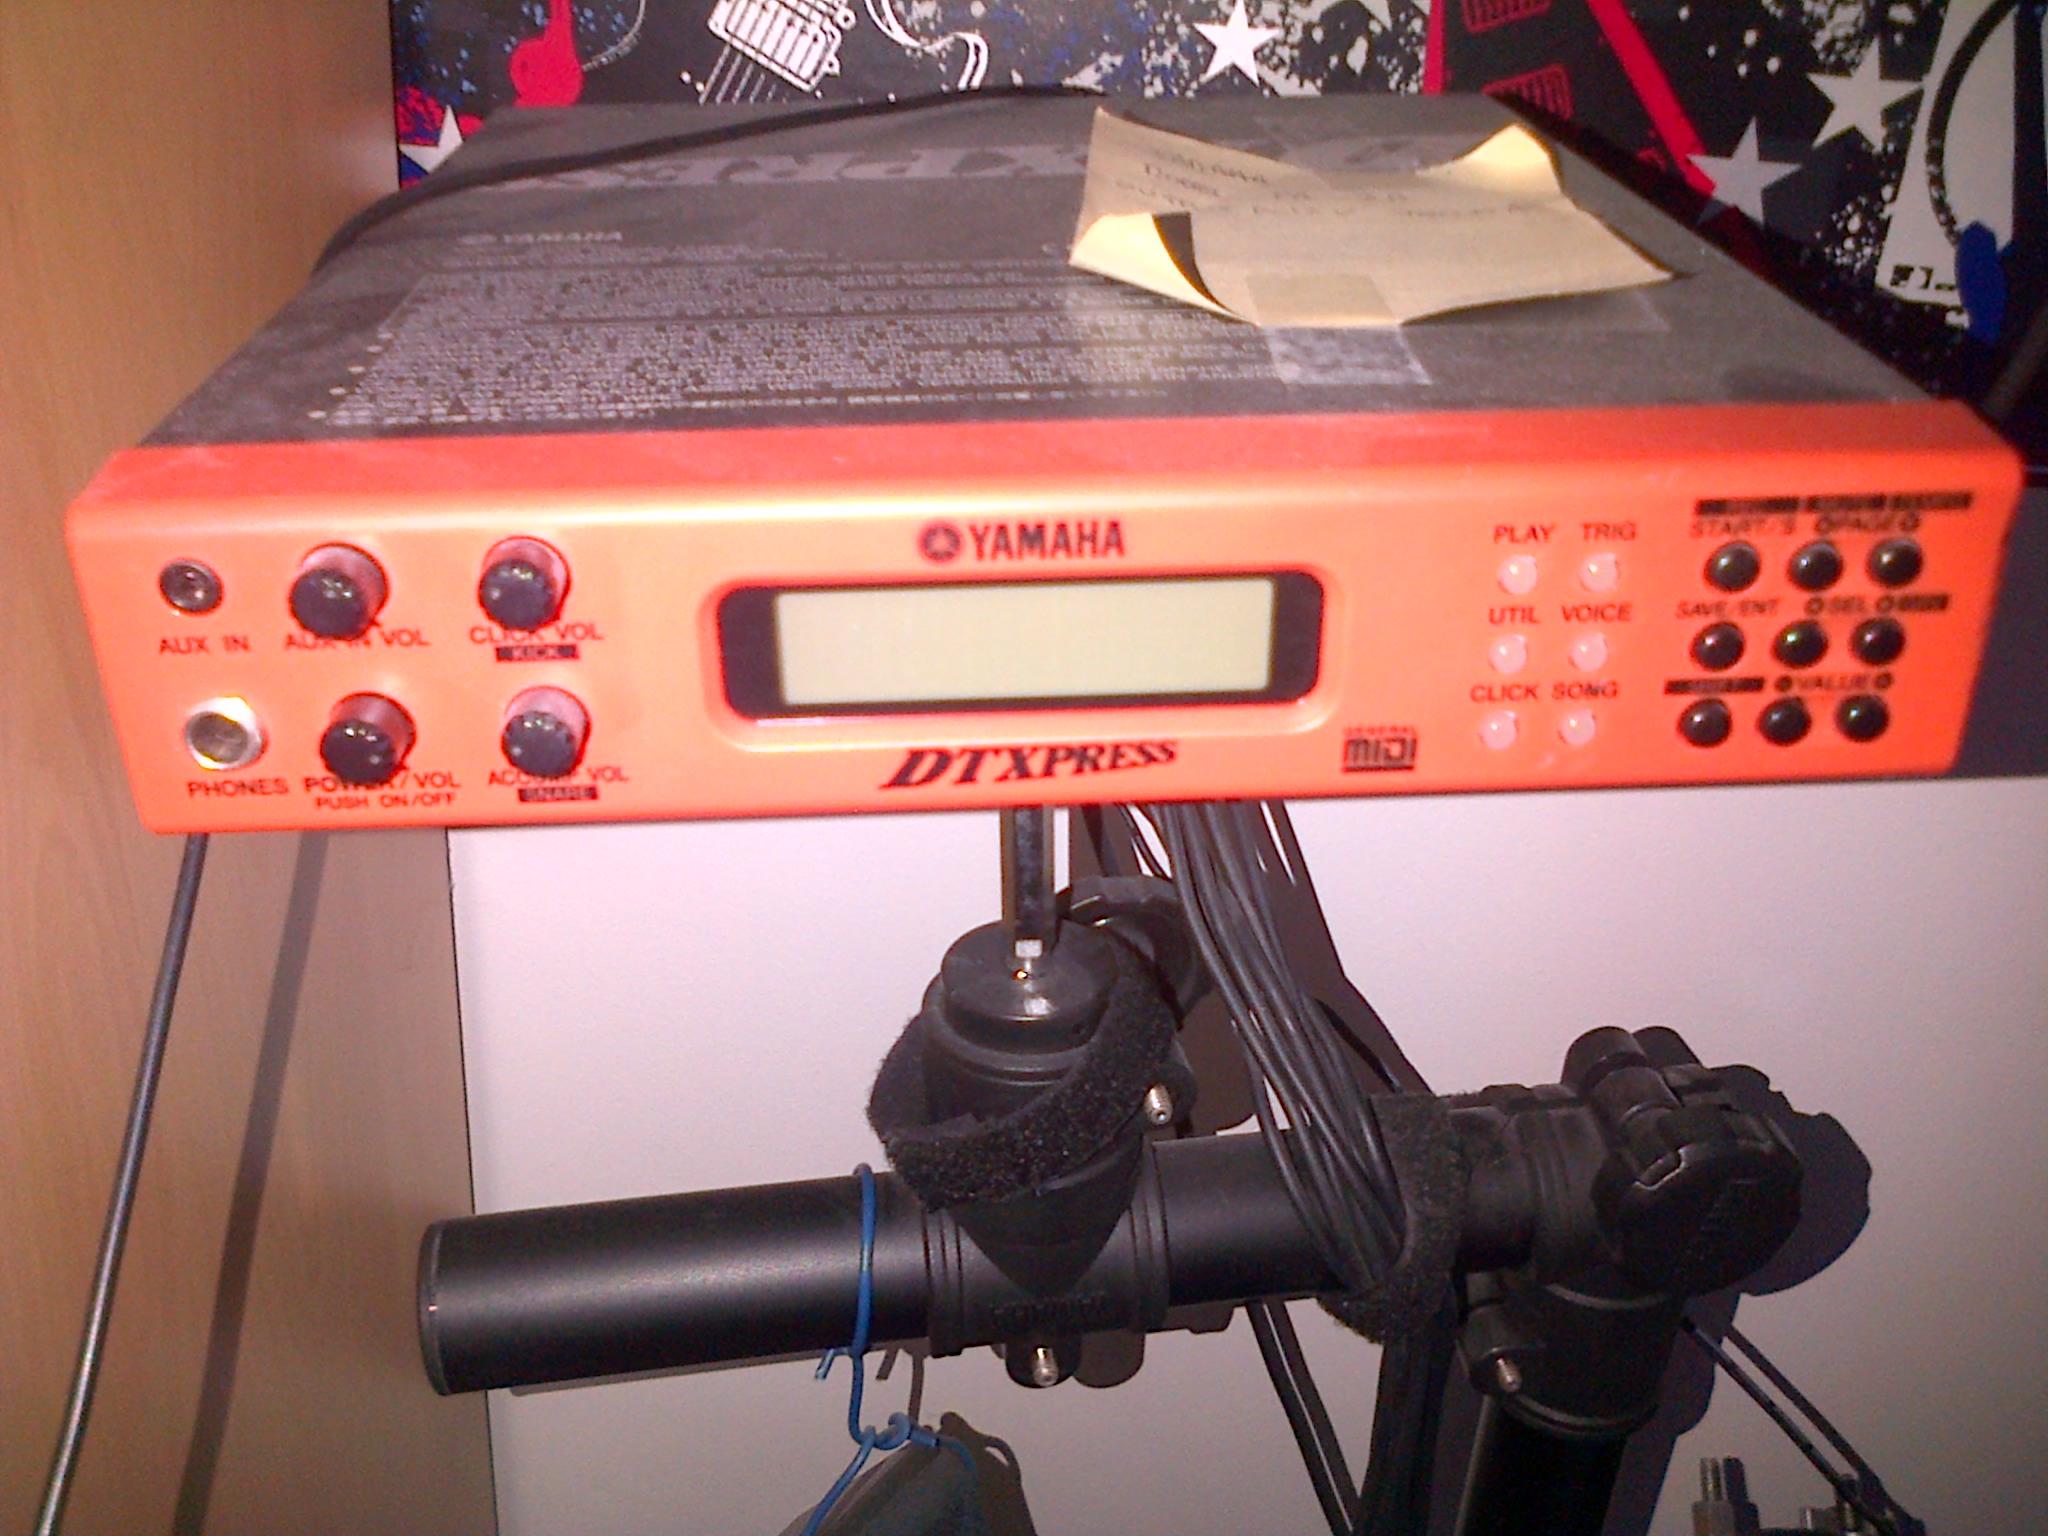 Yamaha dtxpress iii image 579399 audiofanzine for Yamaha dtxpress review